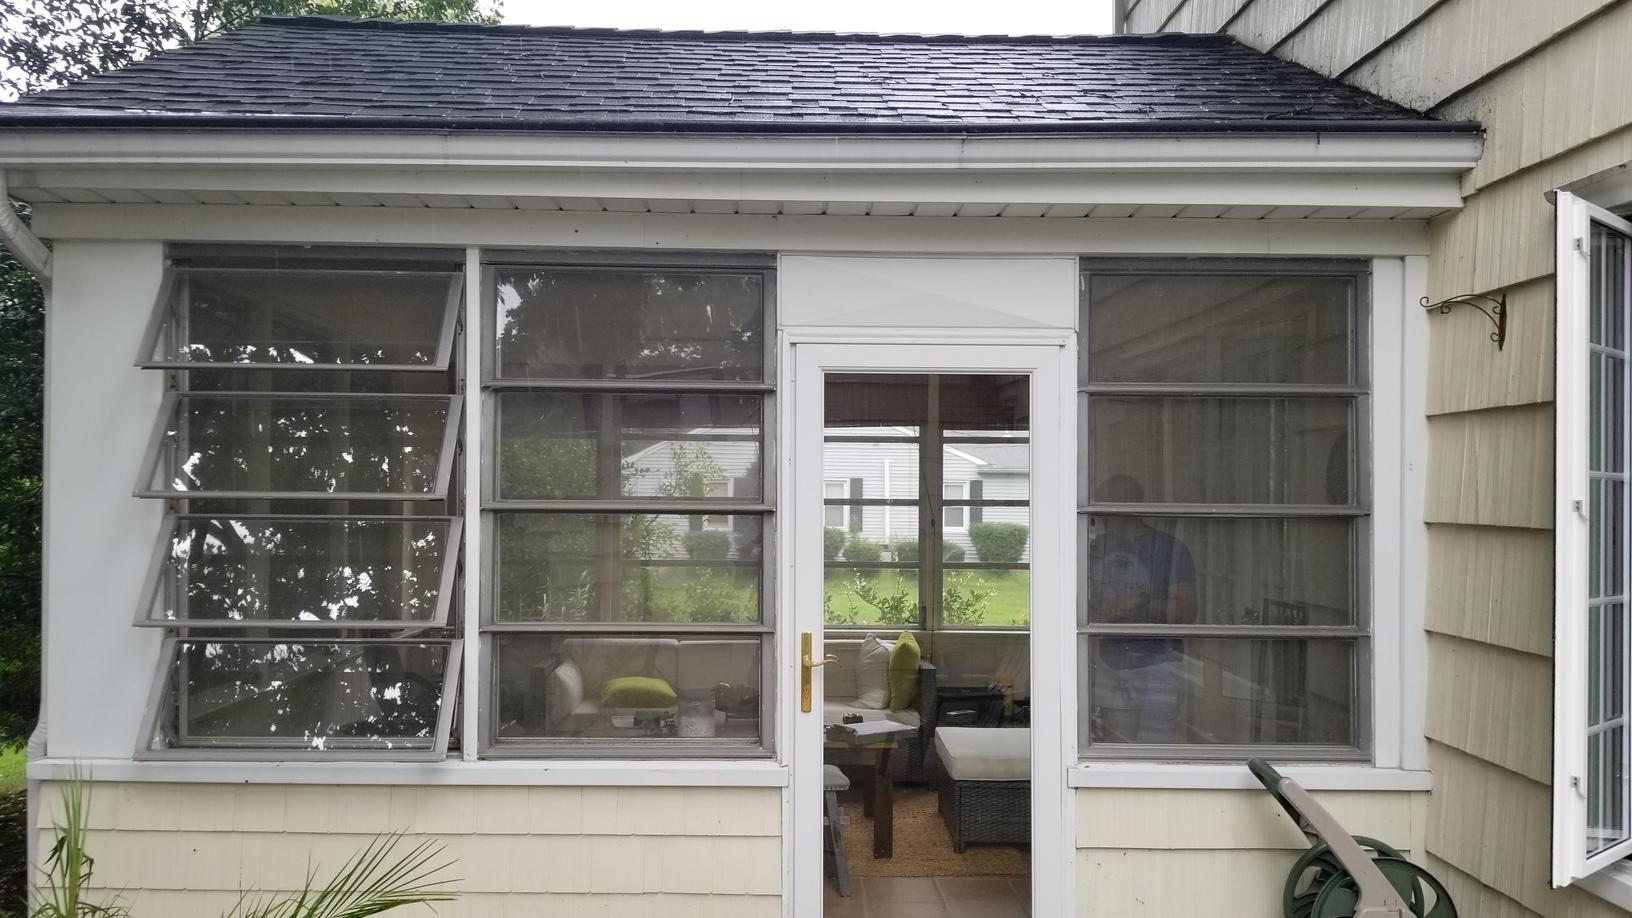 Replacing Aluminum Single Pane Windows in West Windsor, NJ